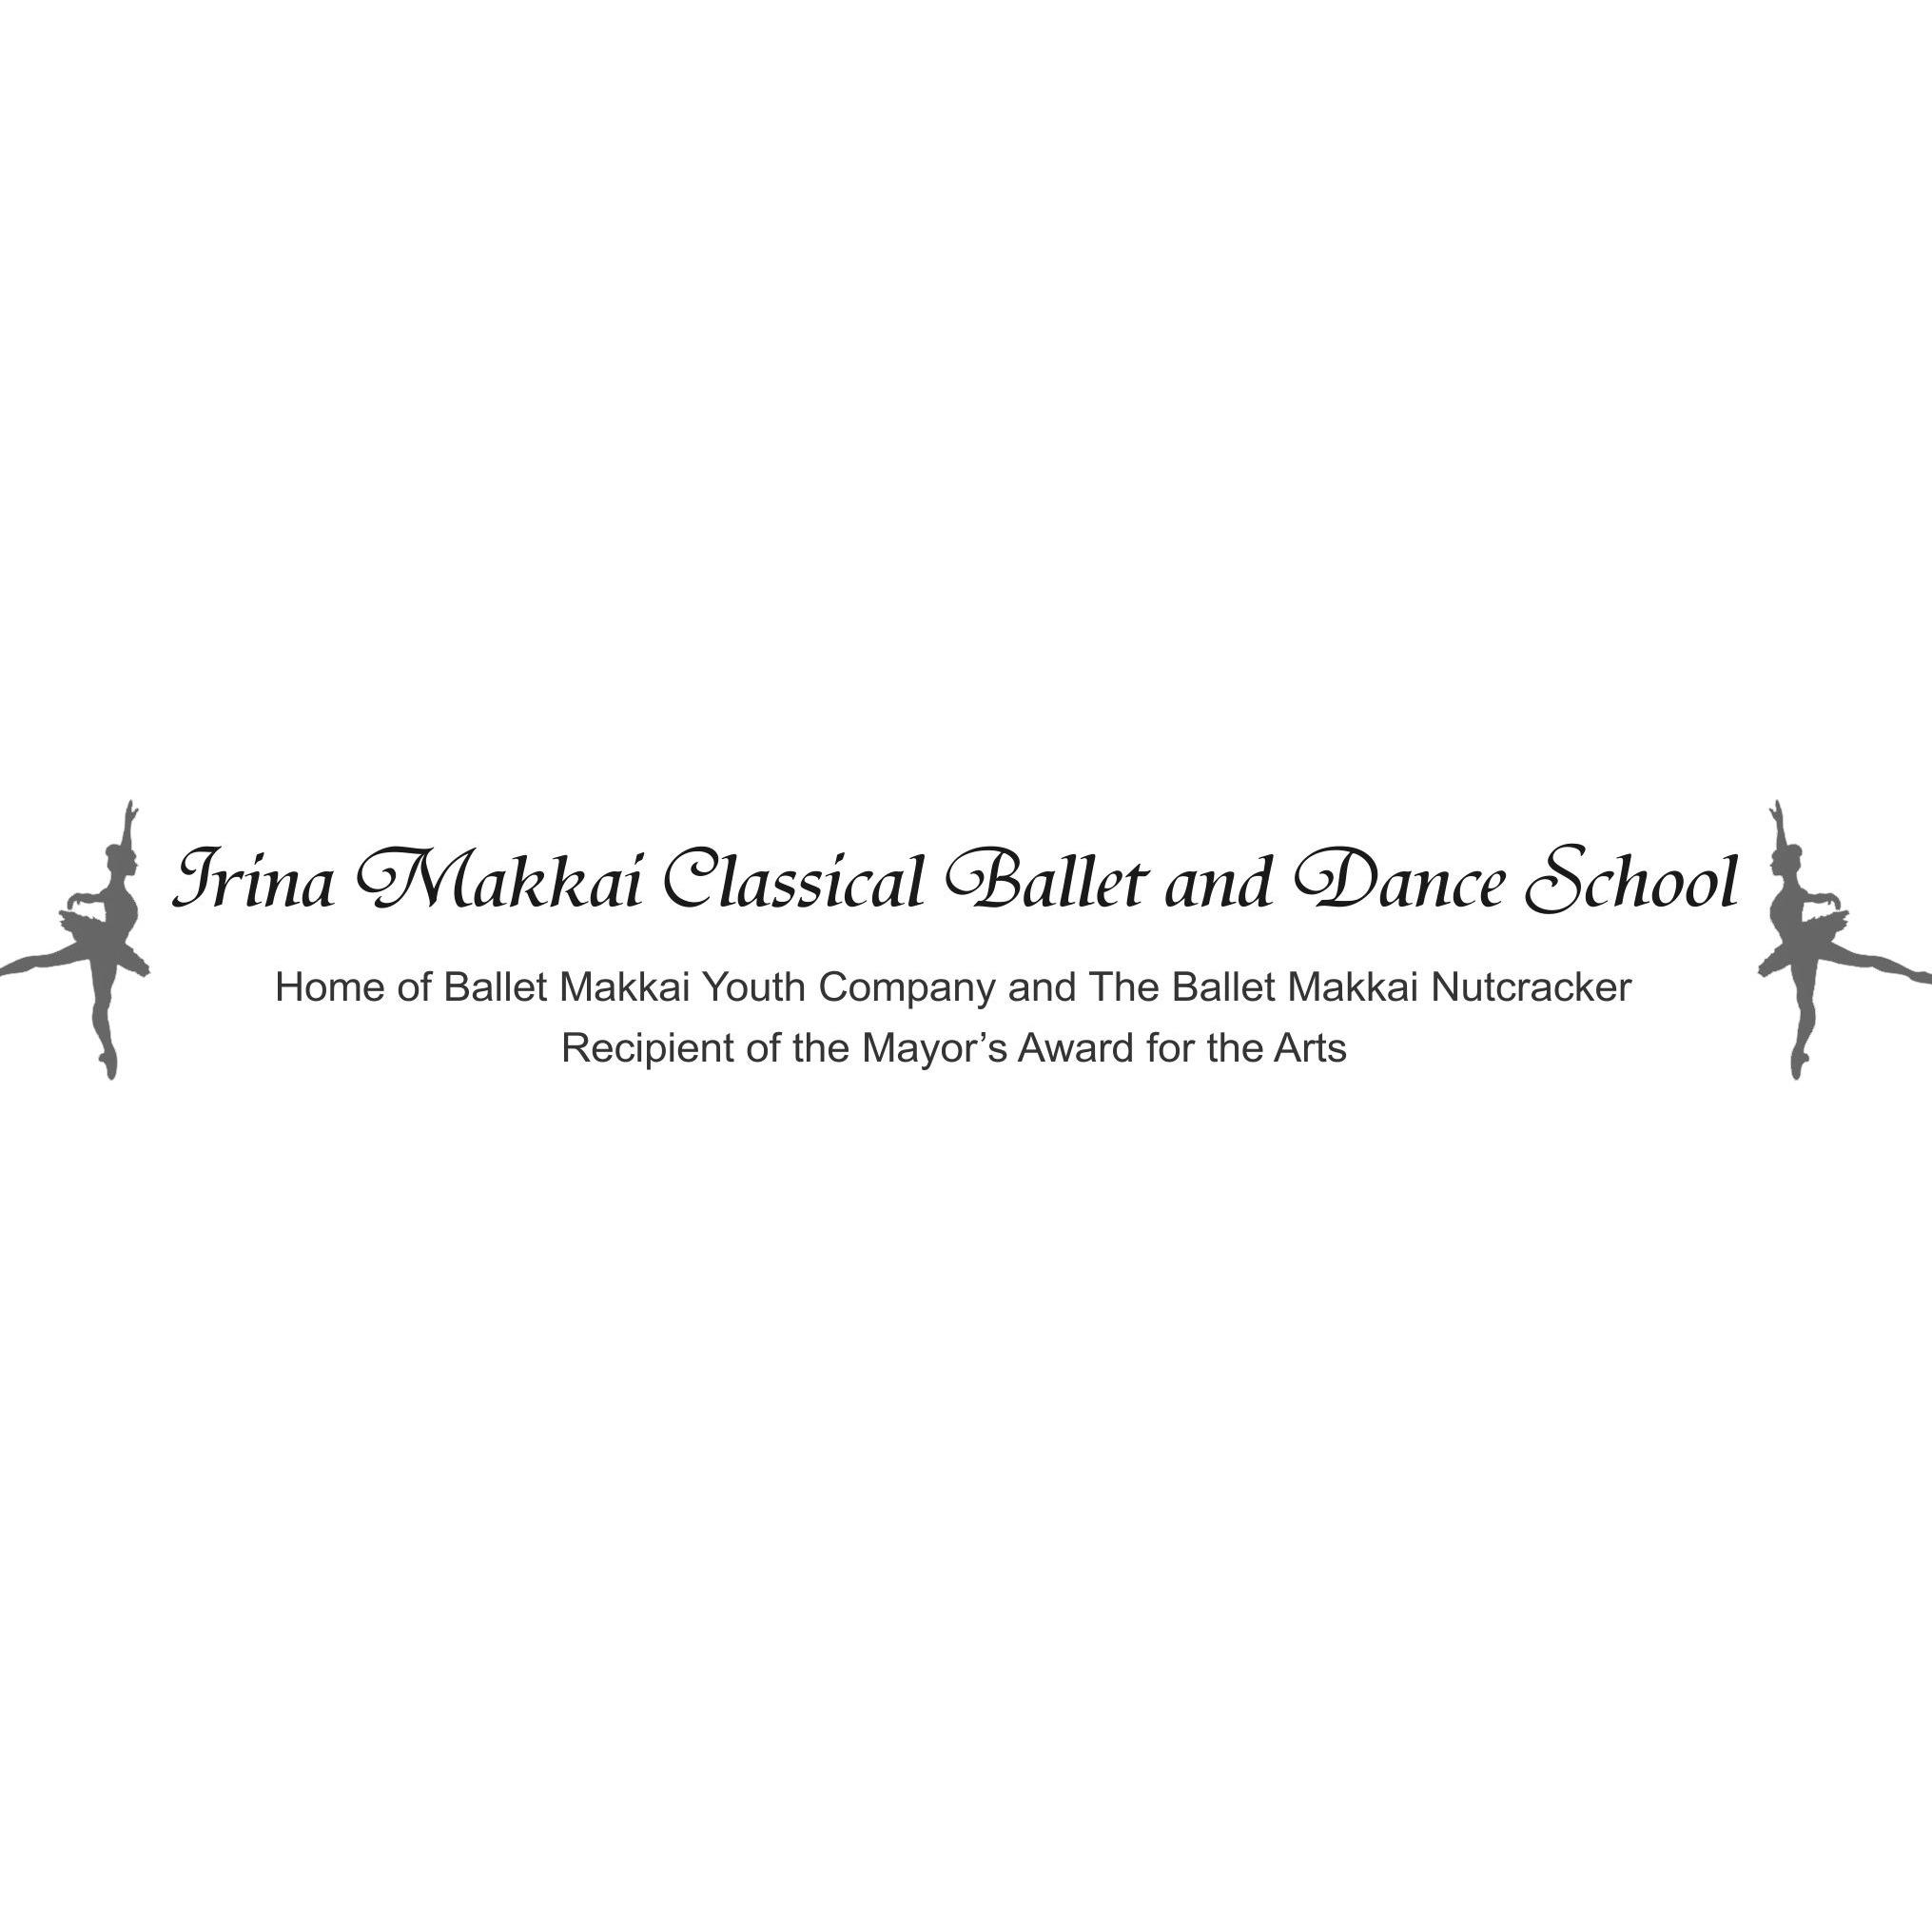 Irina Makkai Classical Ballet & Dance School image 5